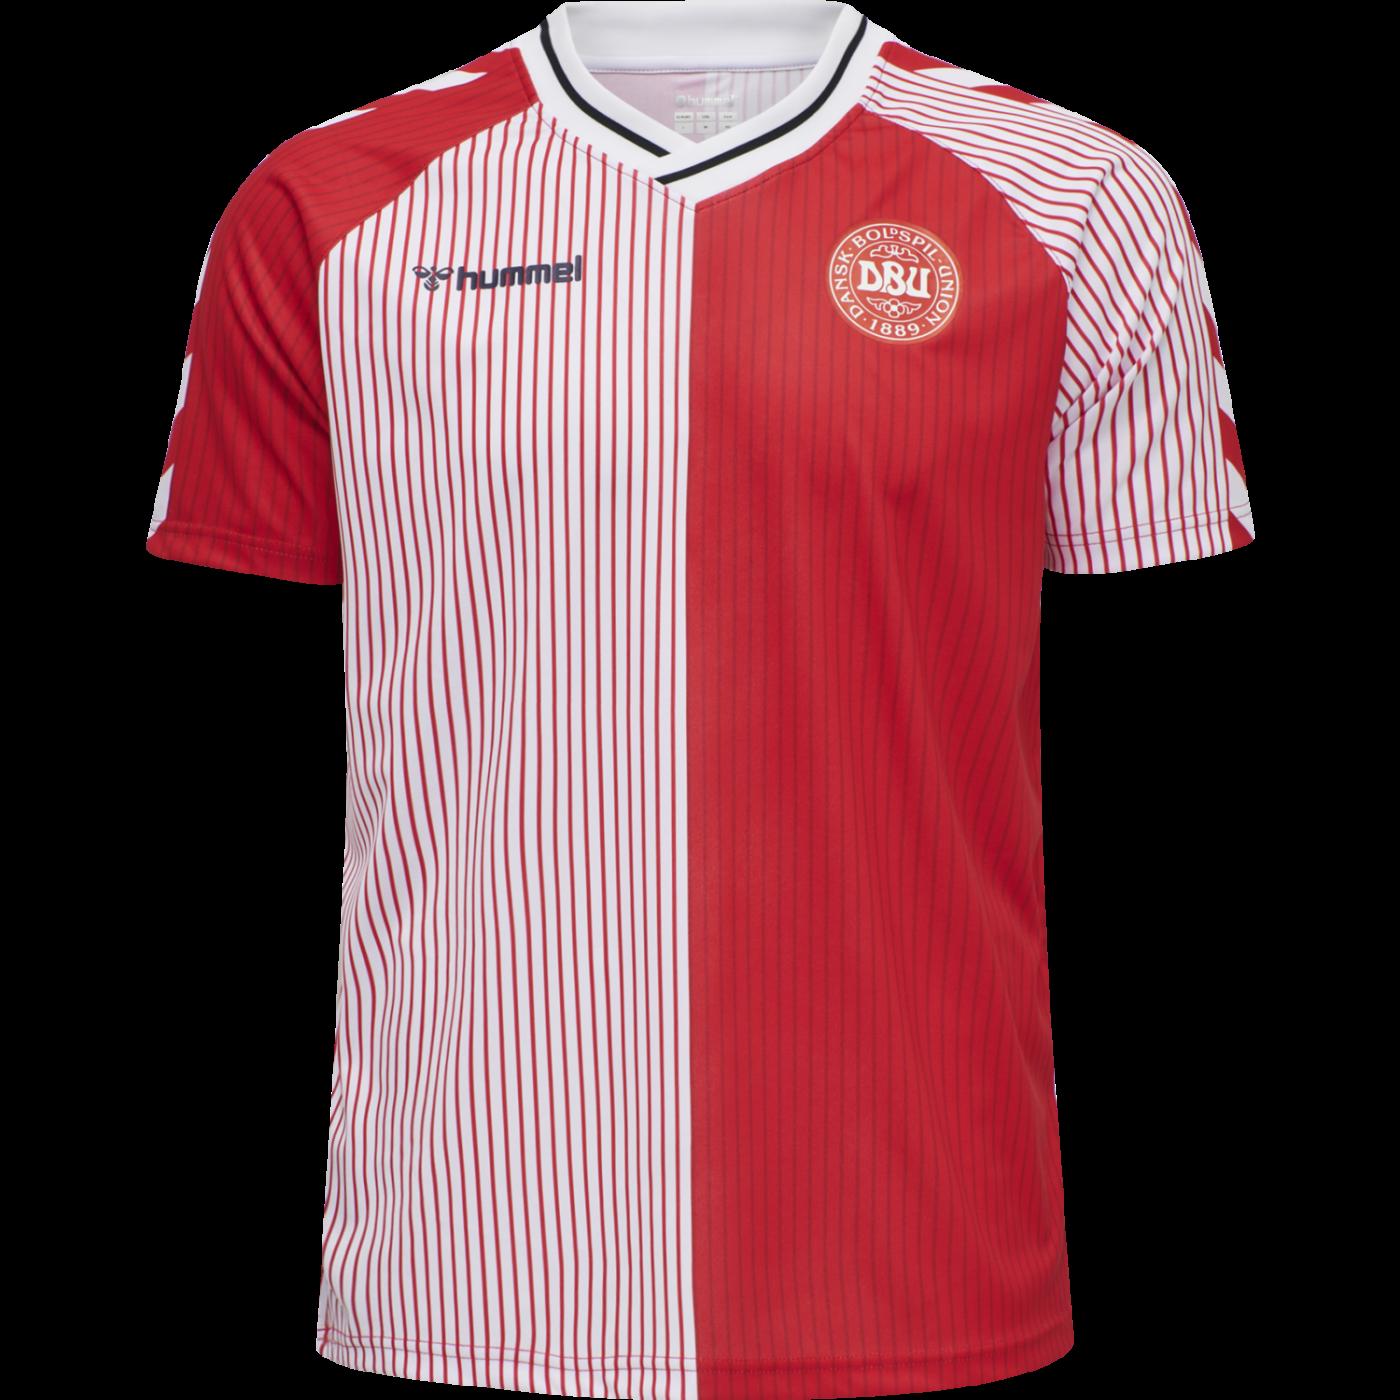 maillot-danemark-1986-hummel-reedition